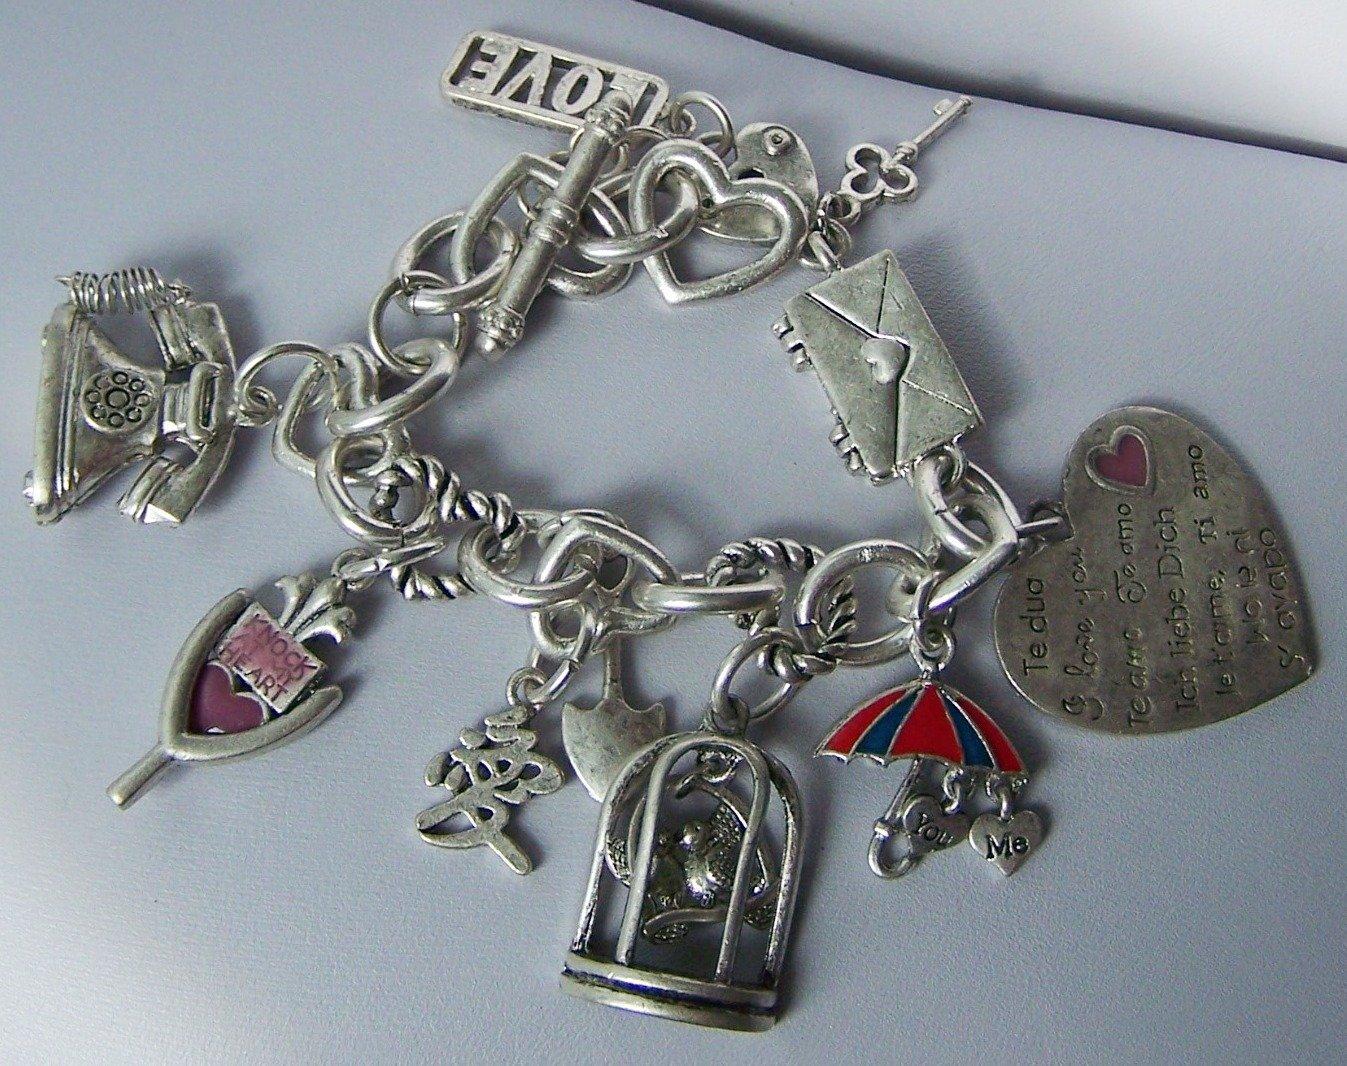 Chunky Filigree Silver Tone Key I Love You Je Ti Amo 3D Heart Love Valentines Day Charm Bracelet